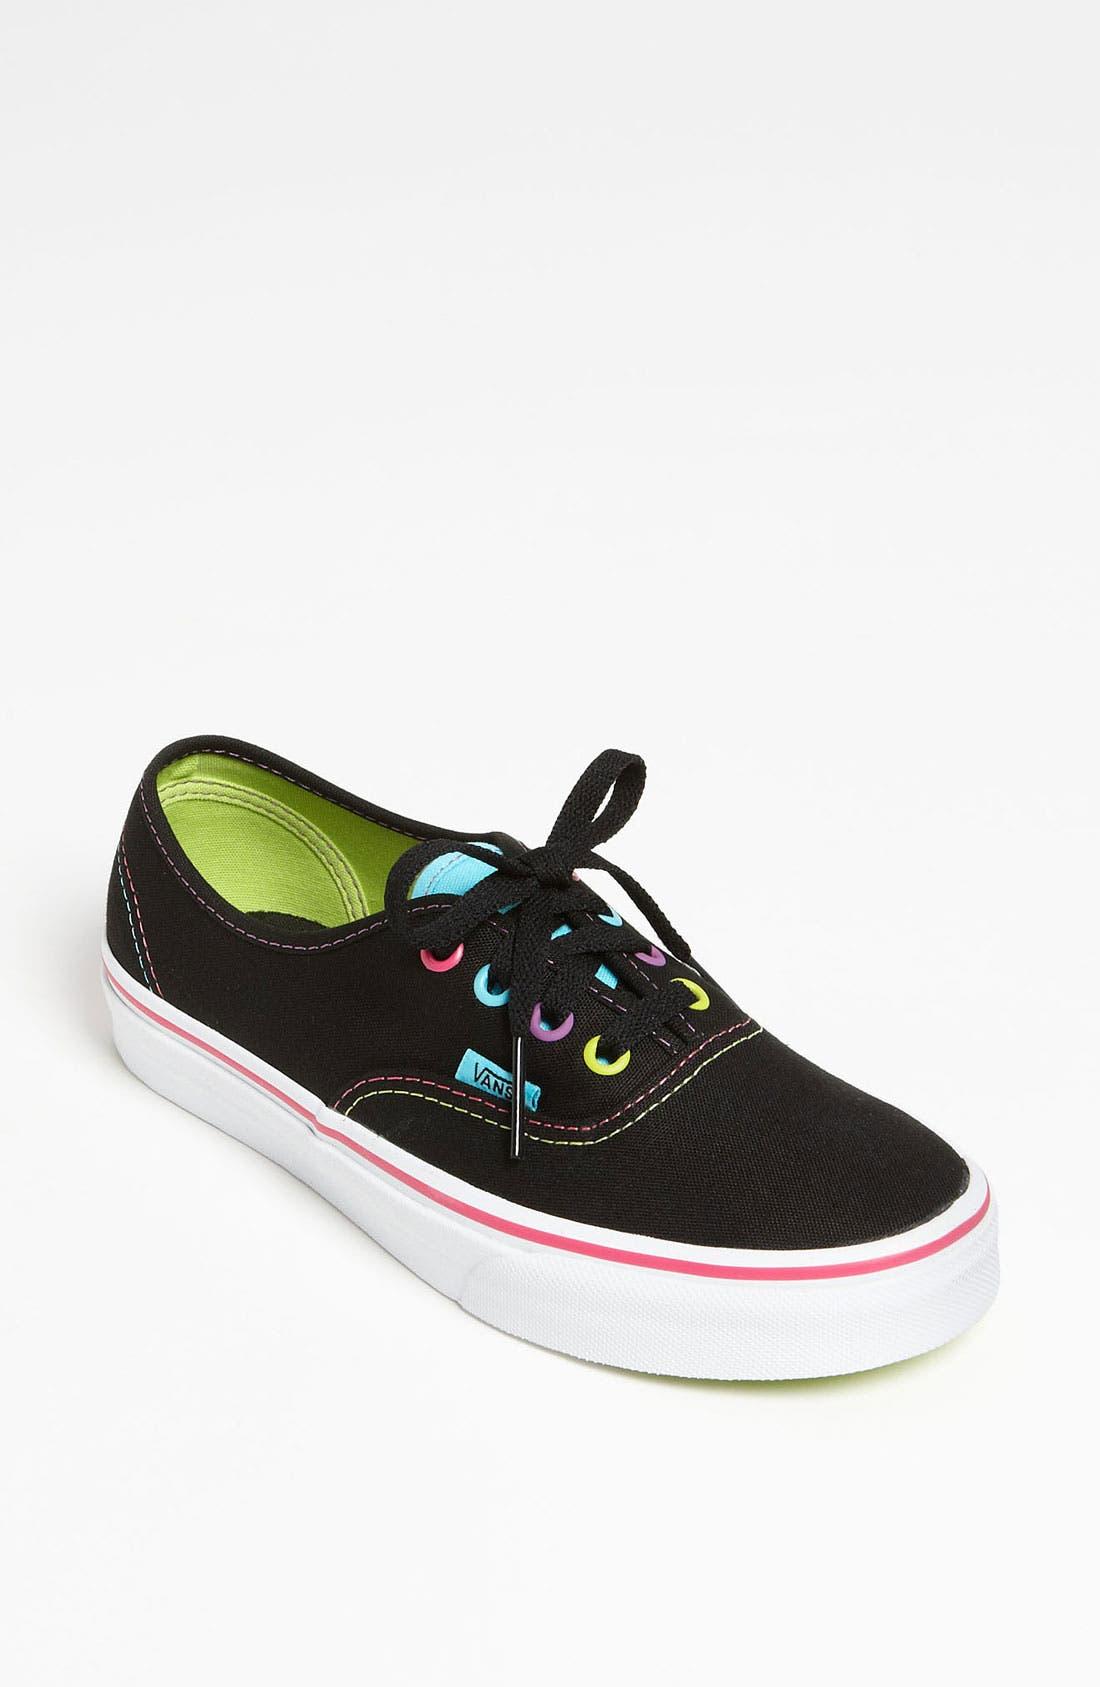 Main Image - Vans 'Authentic - Multi Pop' Sneaker (Women)